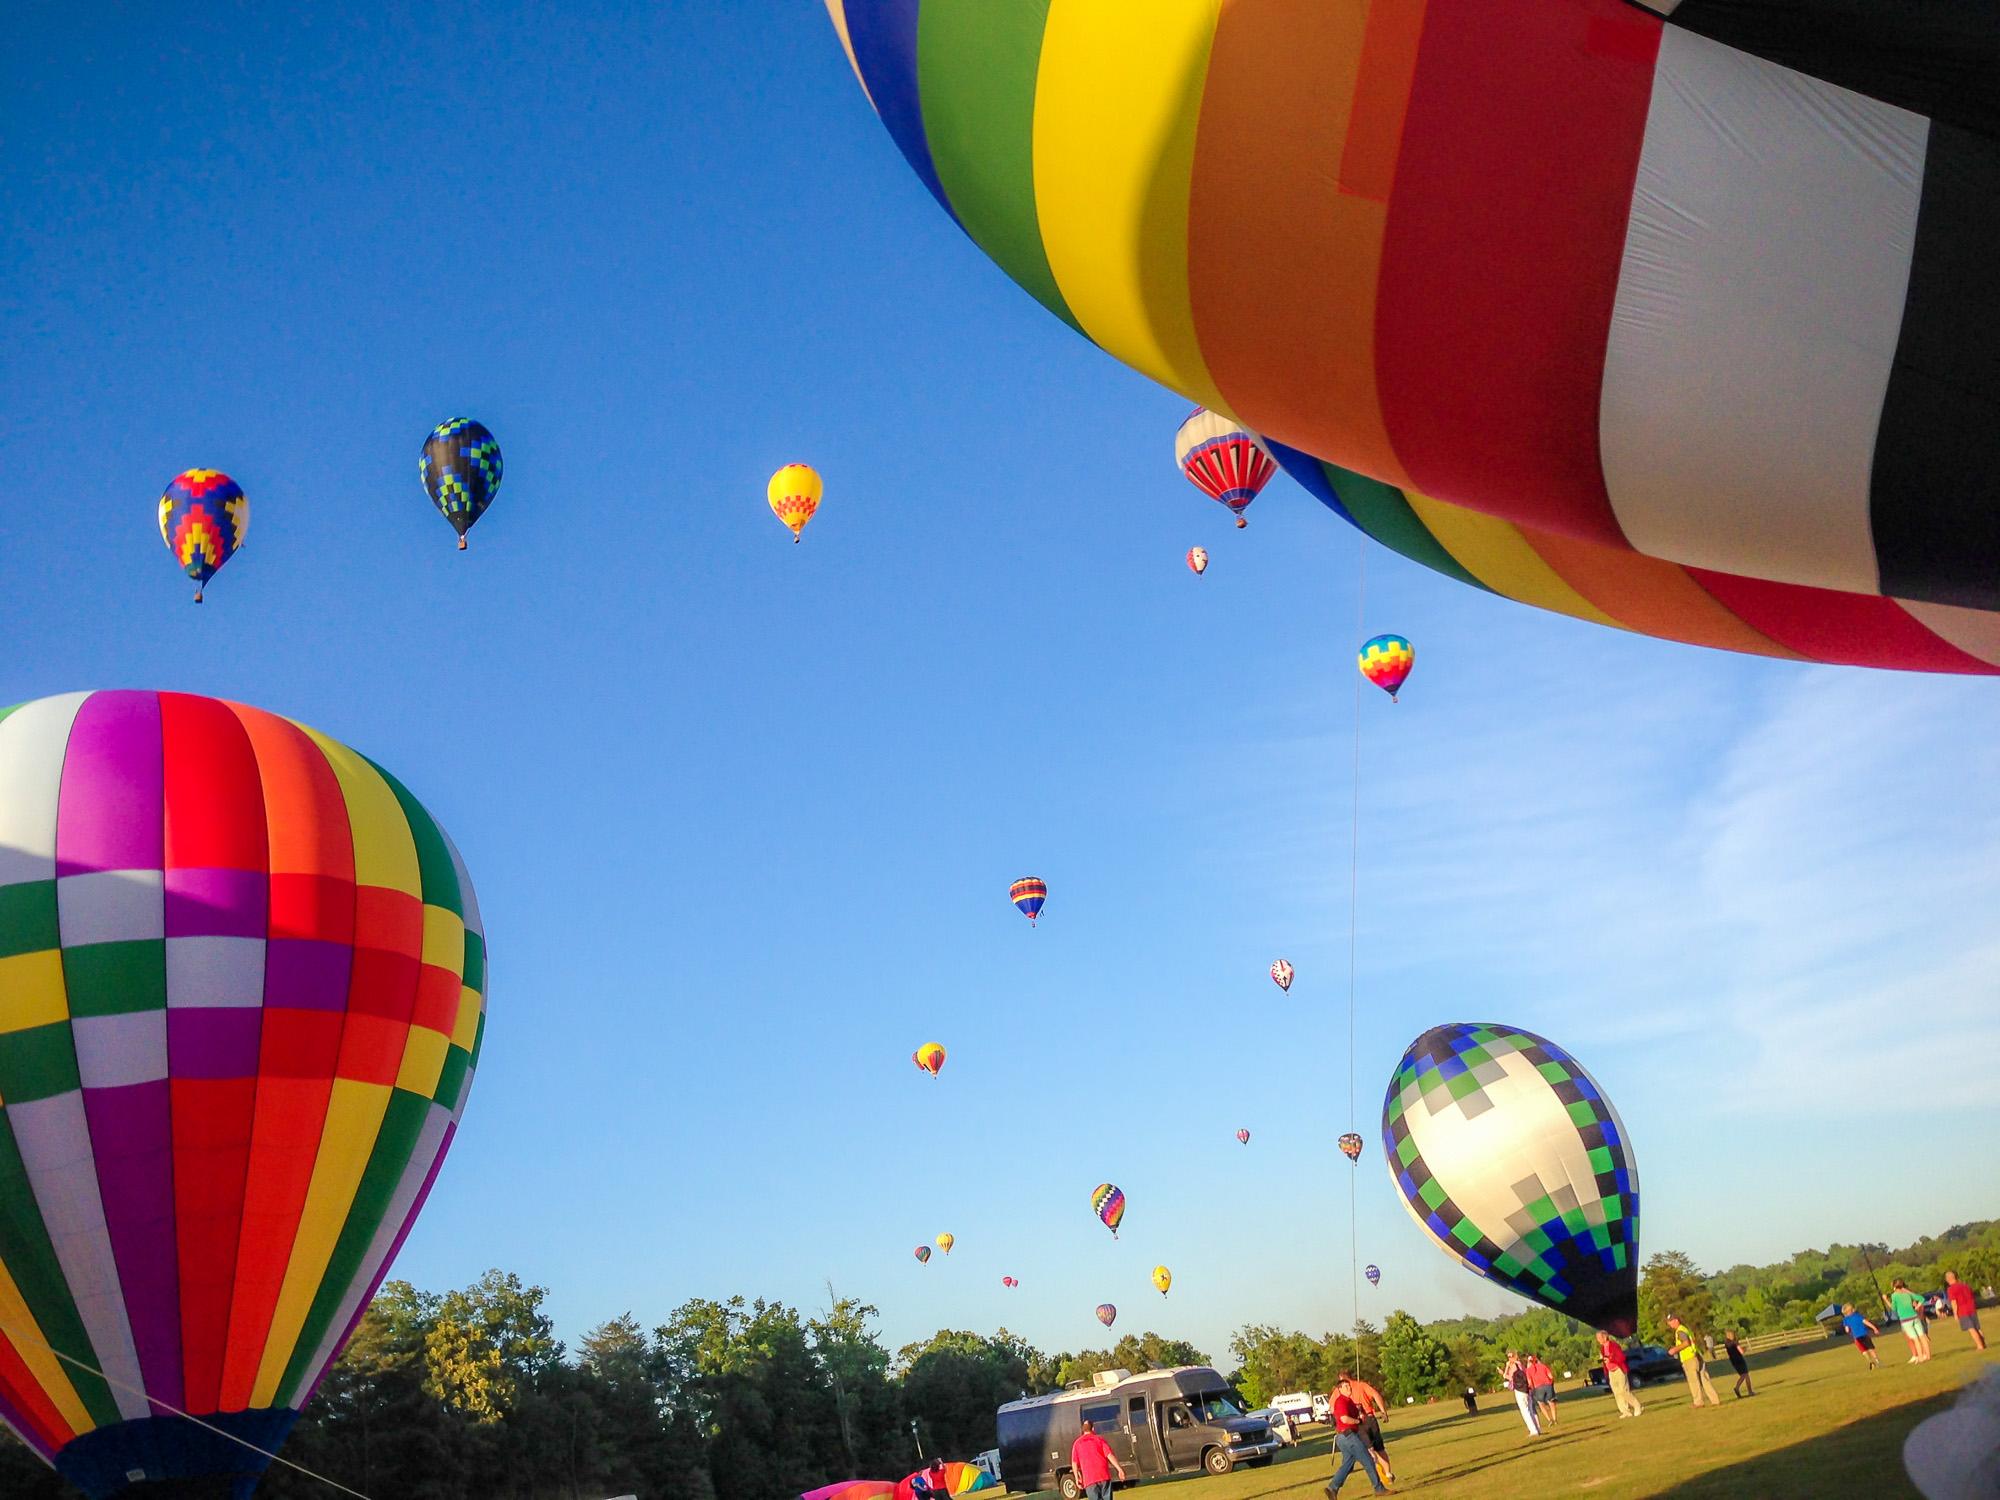 Balloons-38.jpg